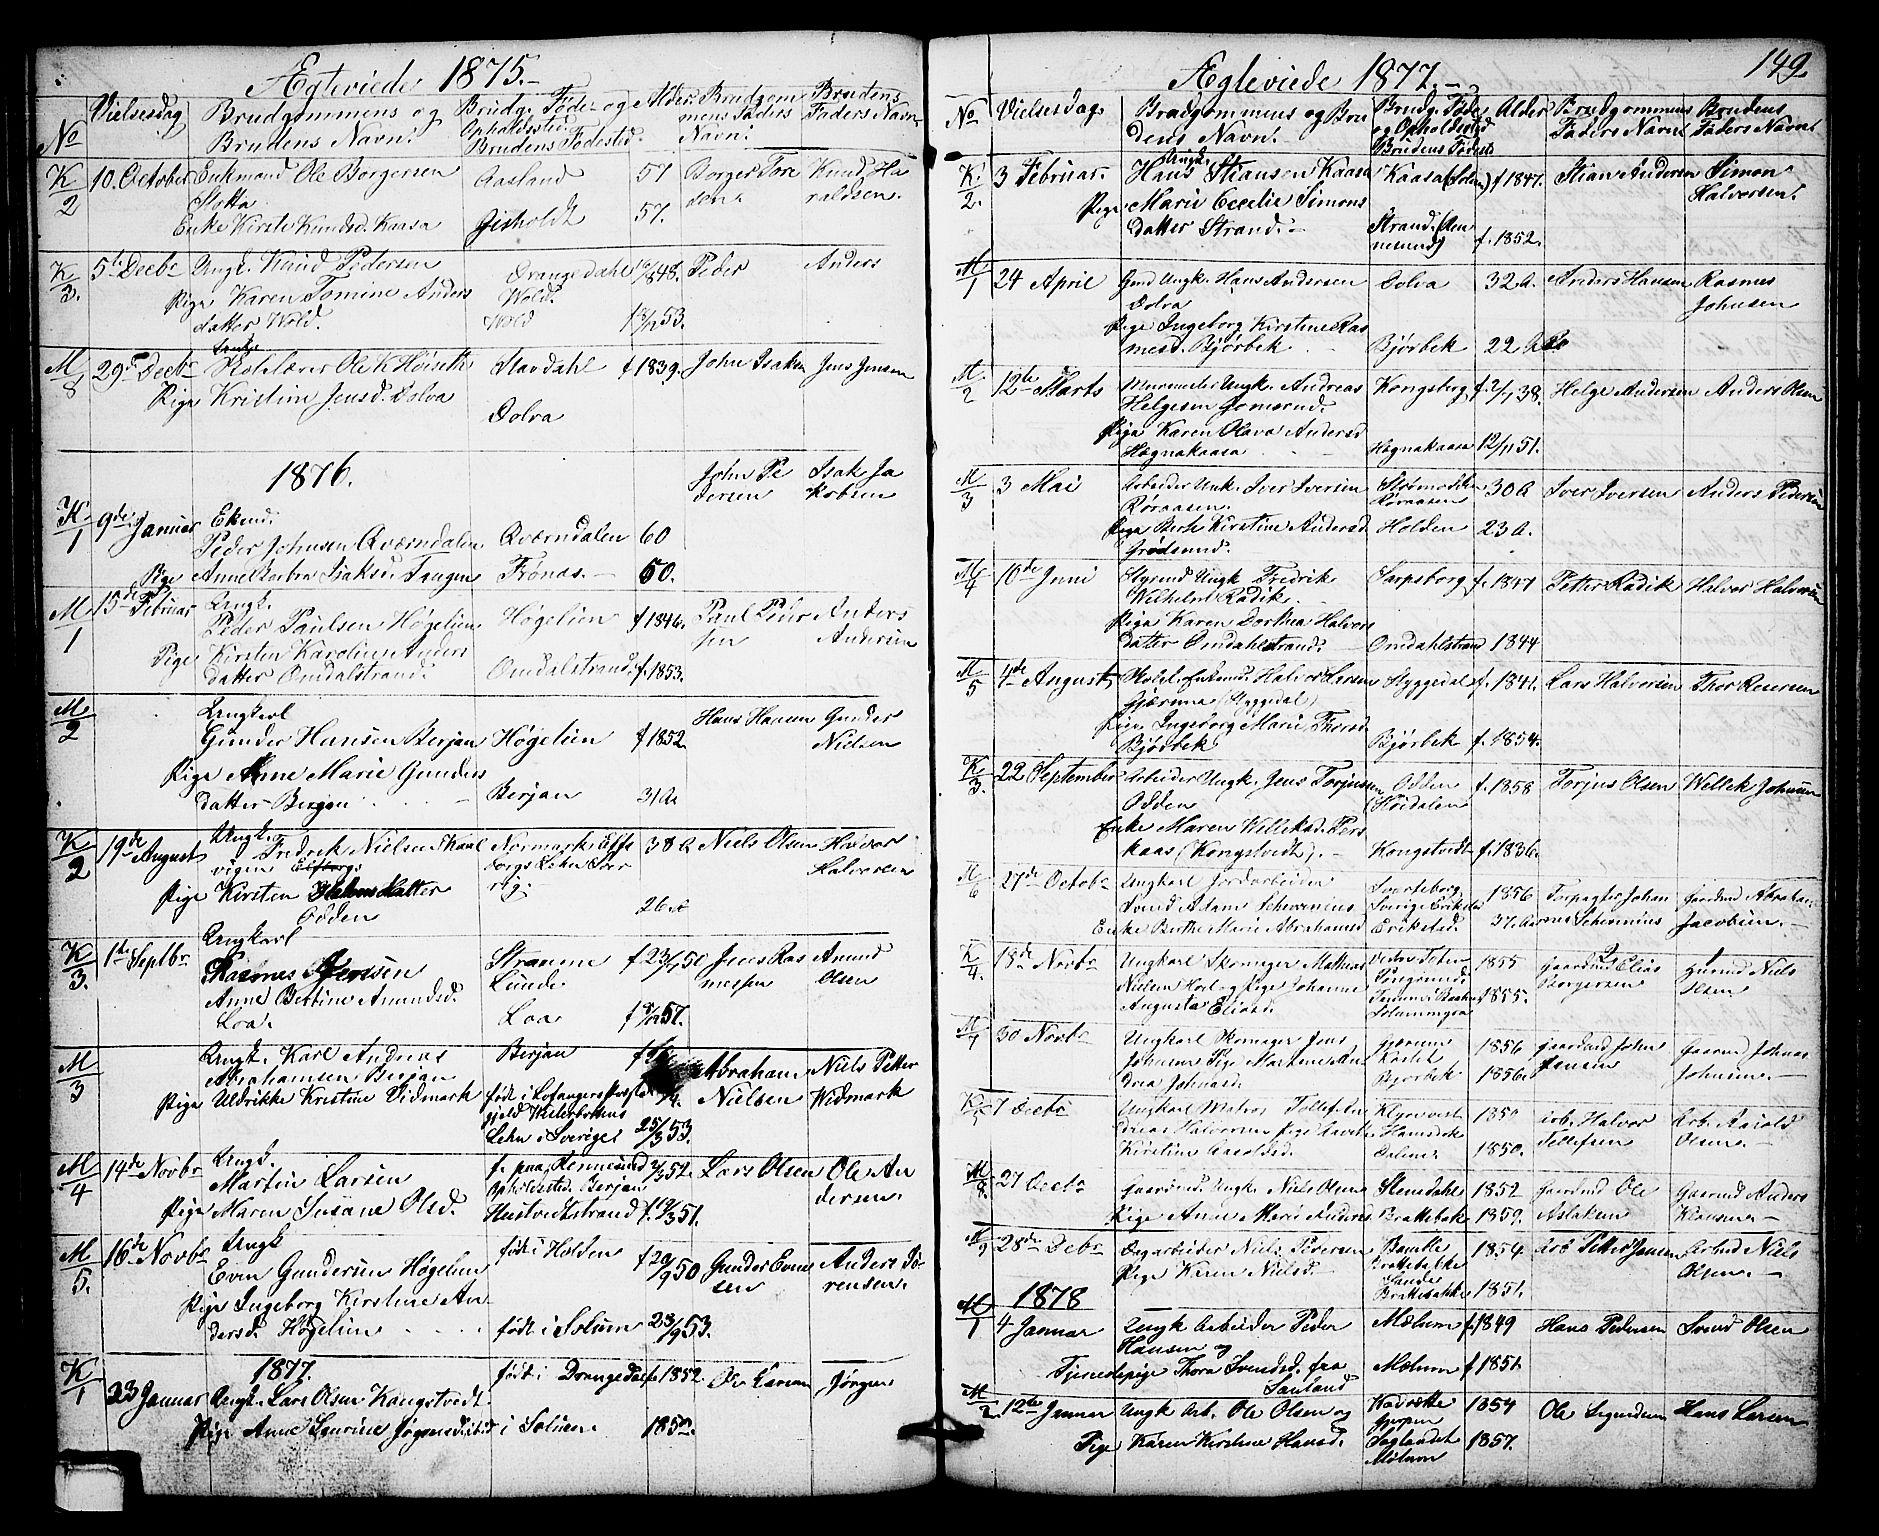 SAKO, Solum kirkebøker, G/Gb/L0002: Klokkerbok nr. II 2, 1859-1879, s. 149